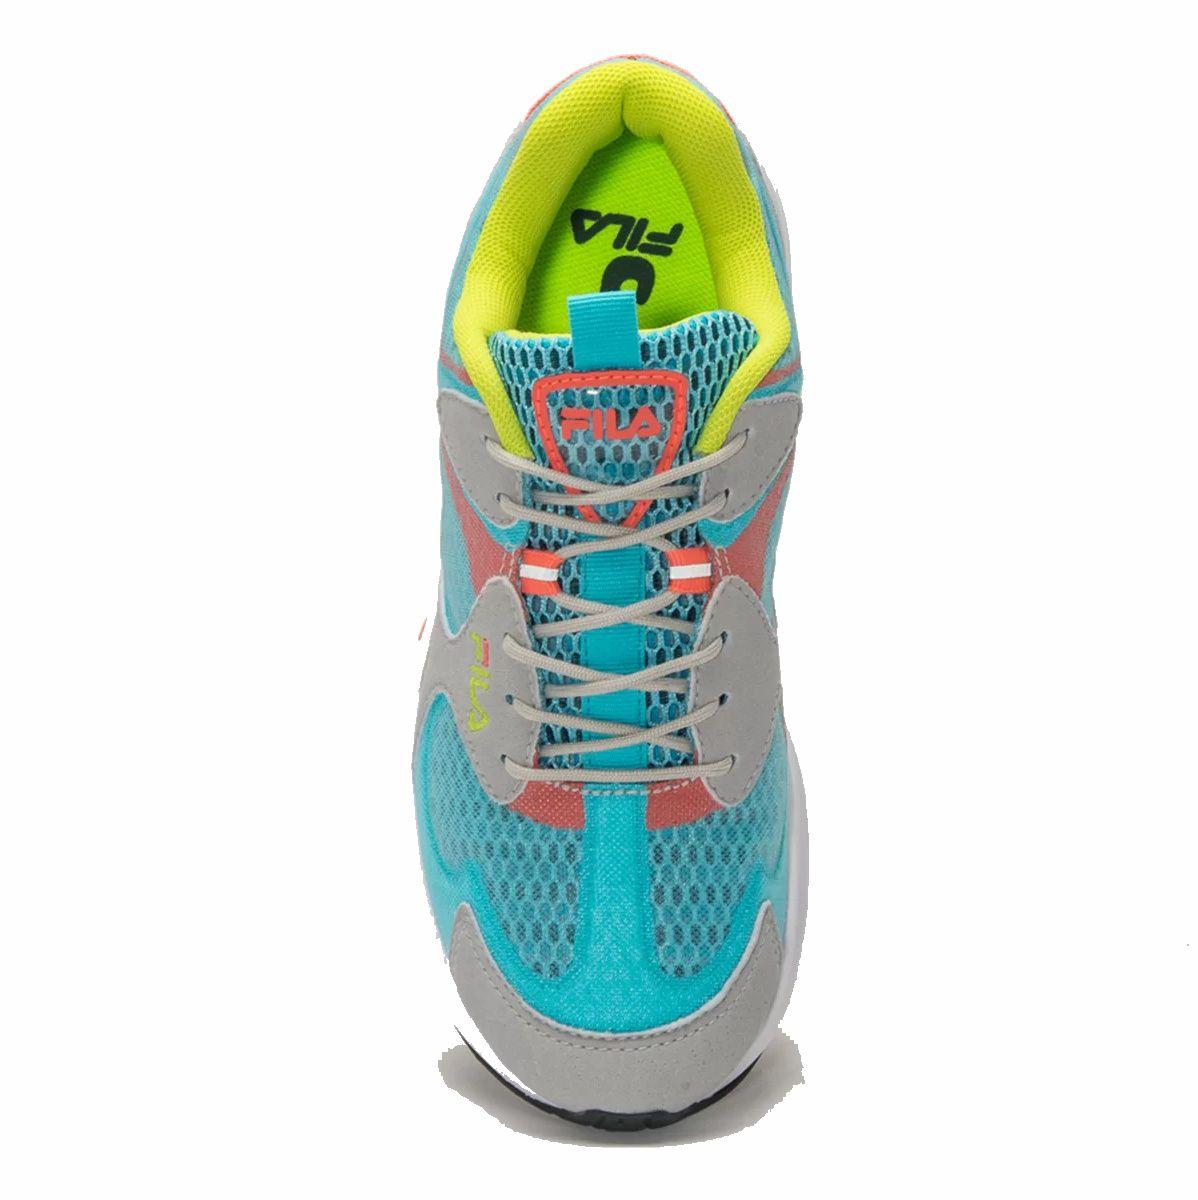 Tenis Fila Carrera Tech Feminino Training Running